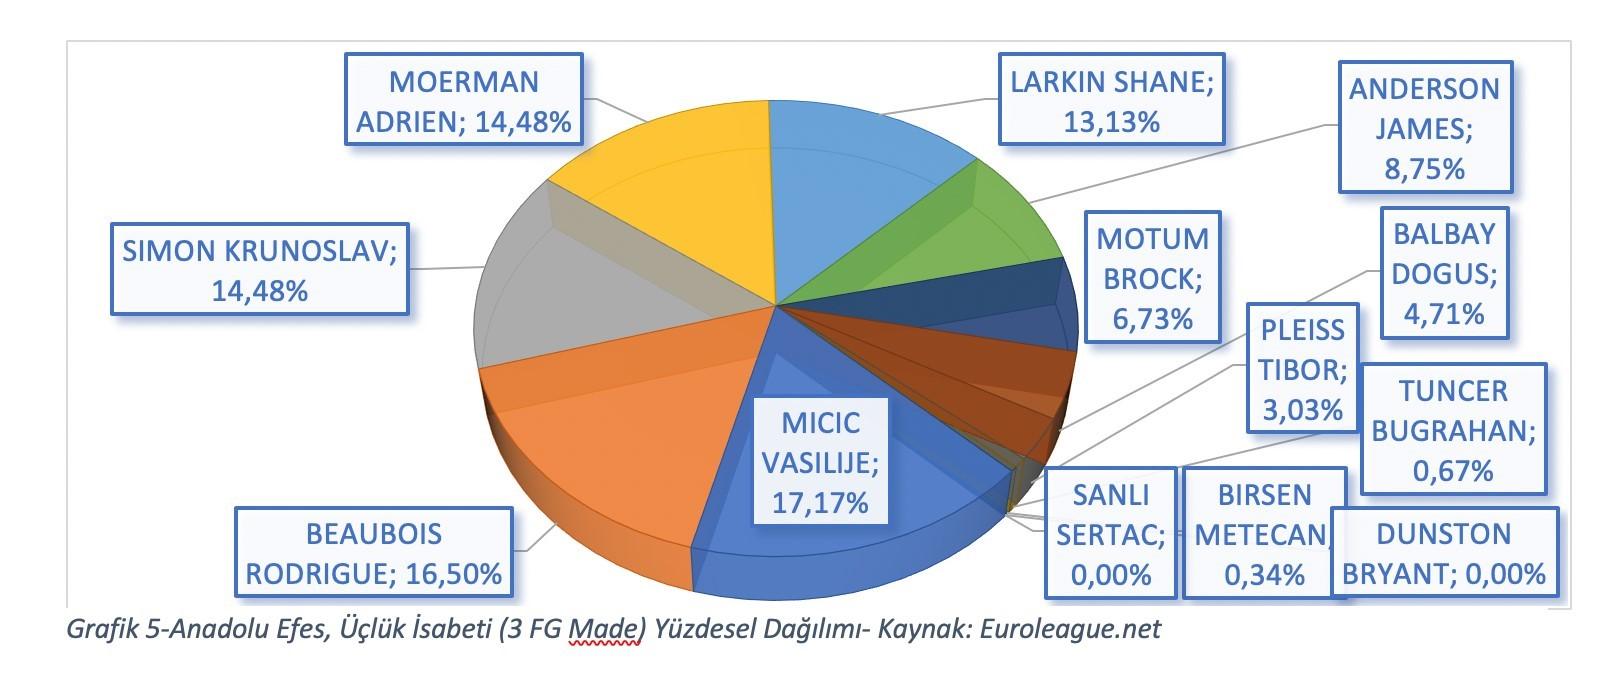 Grafik 5-Anadolu Efes, Üçlük İsabeti (3 FG Made) Yüzdesel Dağılımı- Kaynak: Euroleague.net